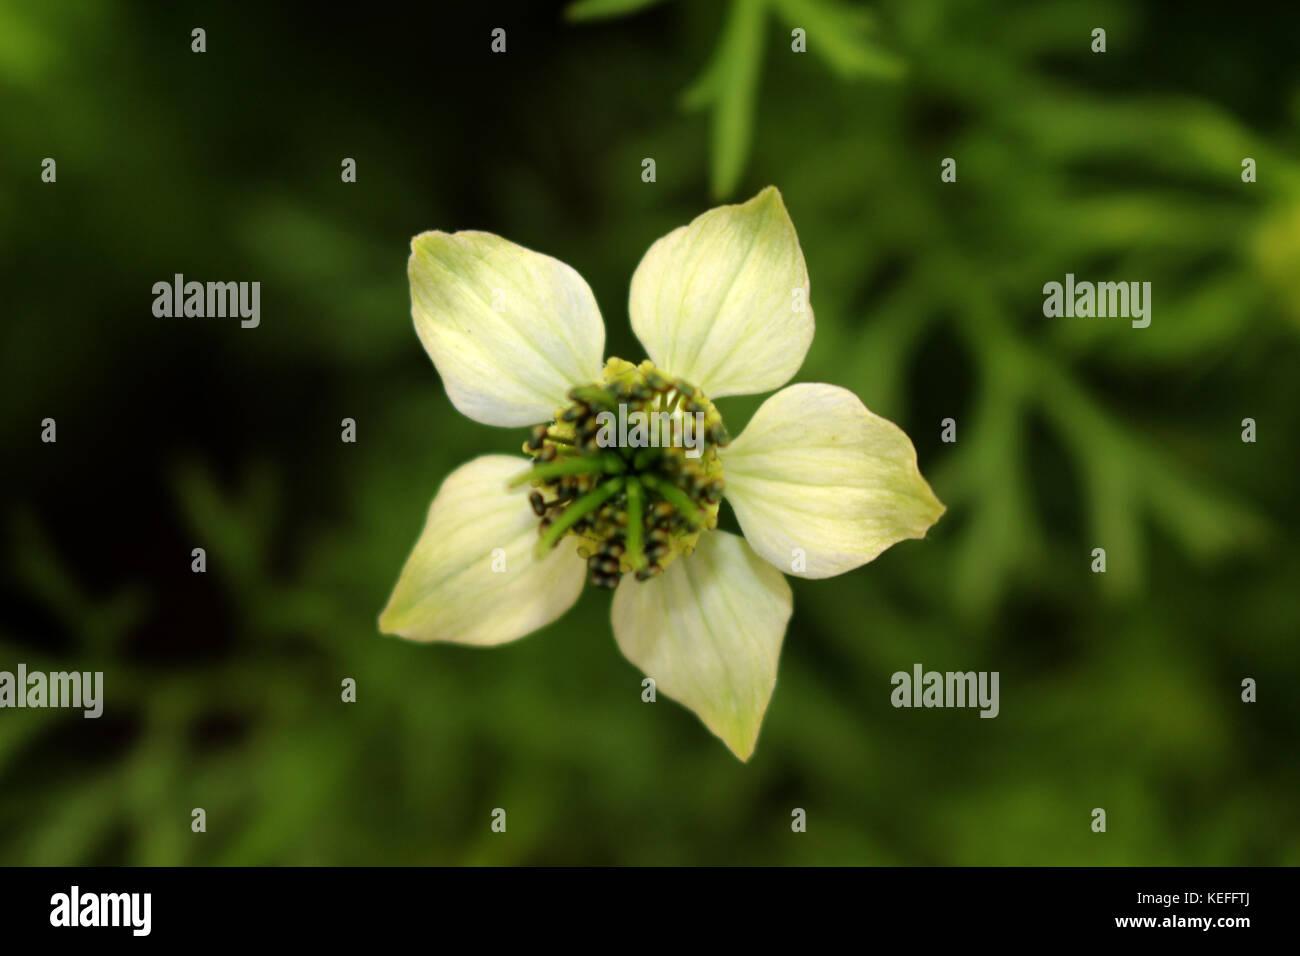 Winter Flower, Very rare capture from random village of Bangladesh. - Stock Image